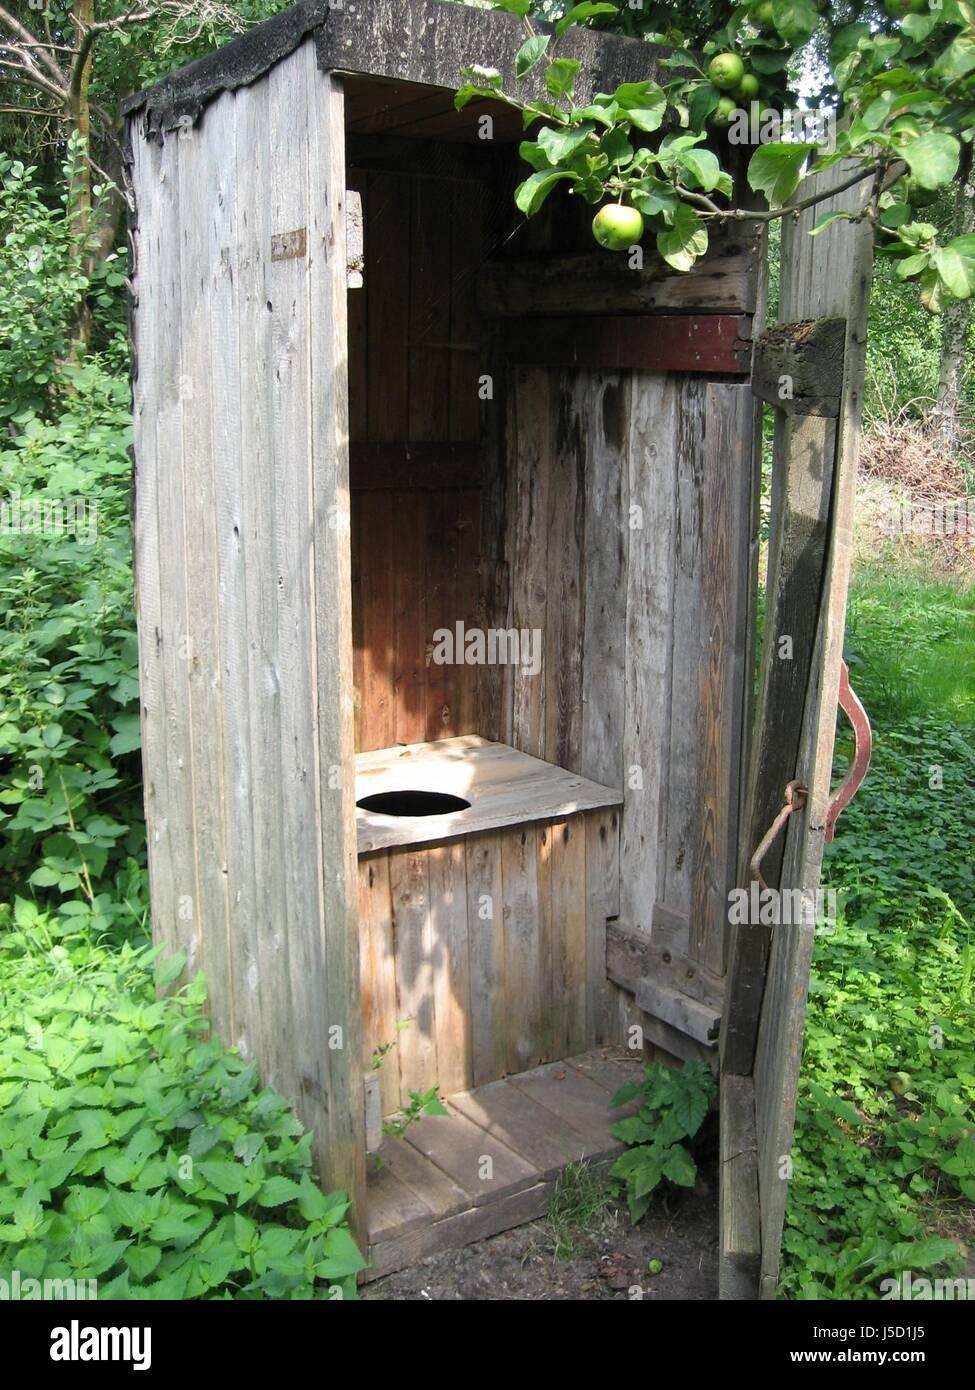 Garten Toilette Gärten Schloss Burg Mittelalter Plumsklo